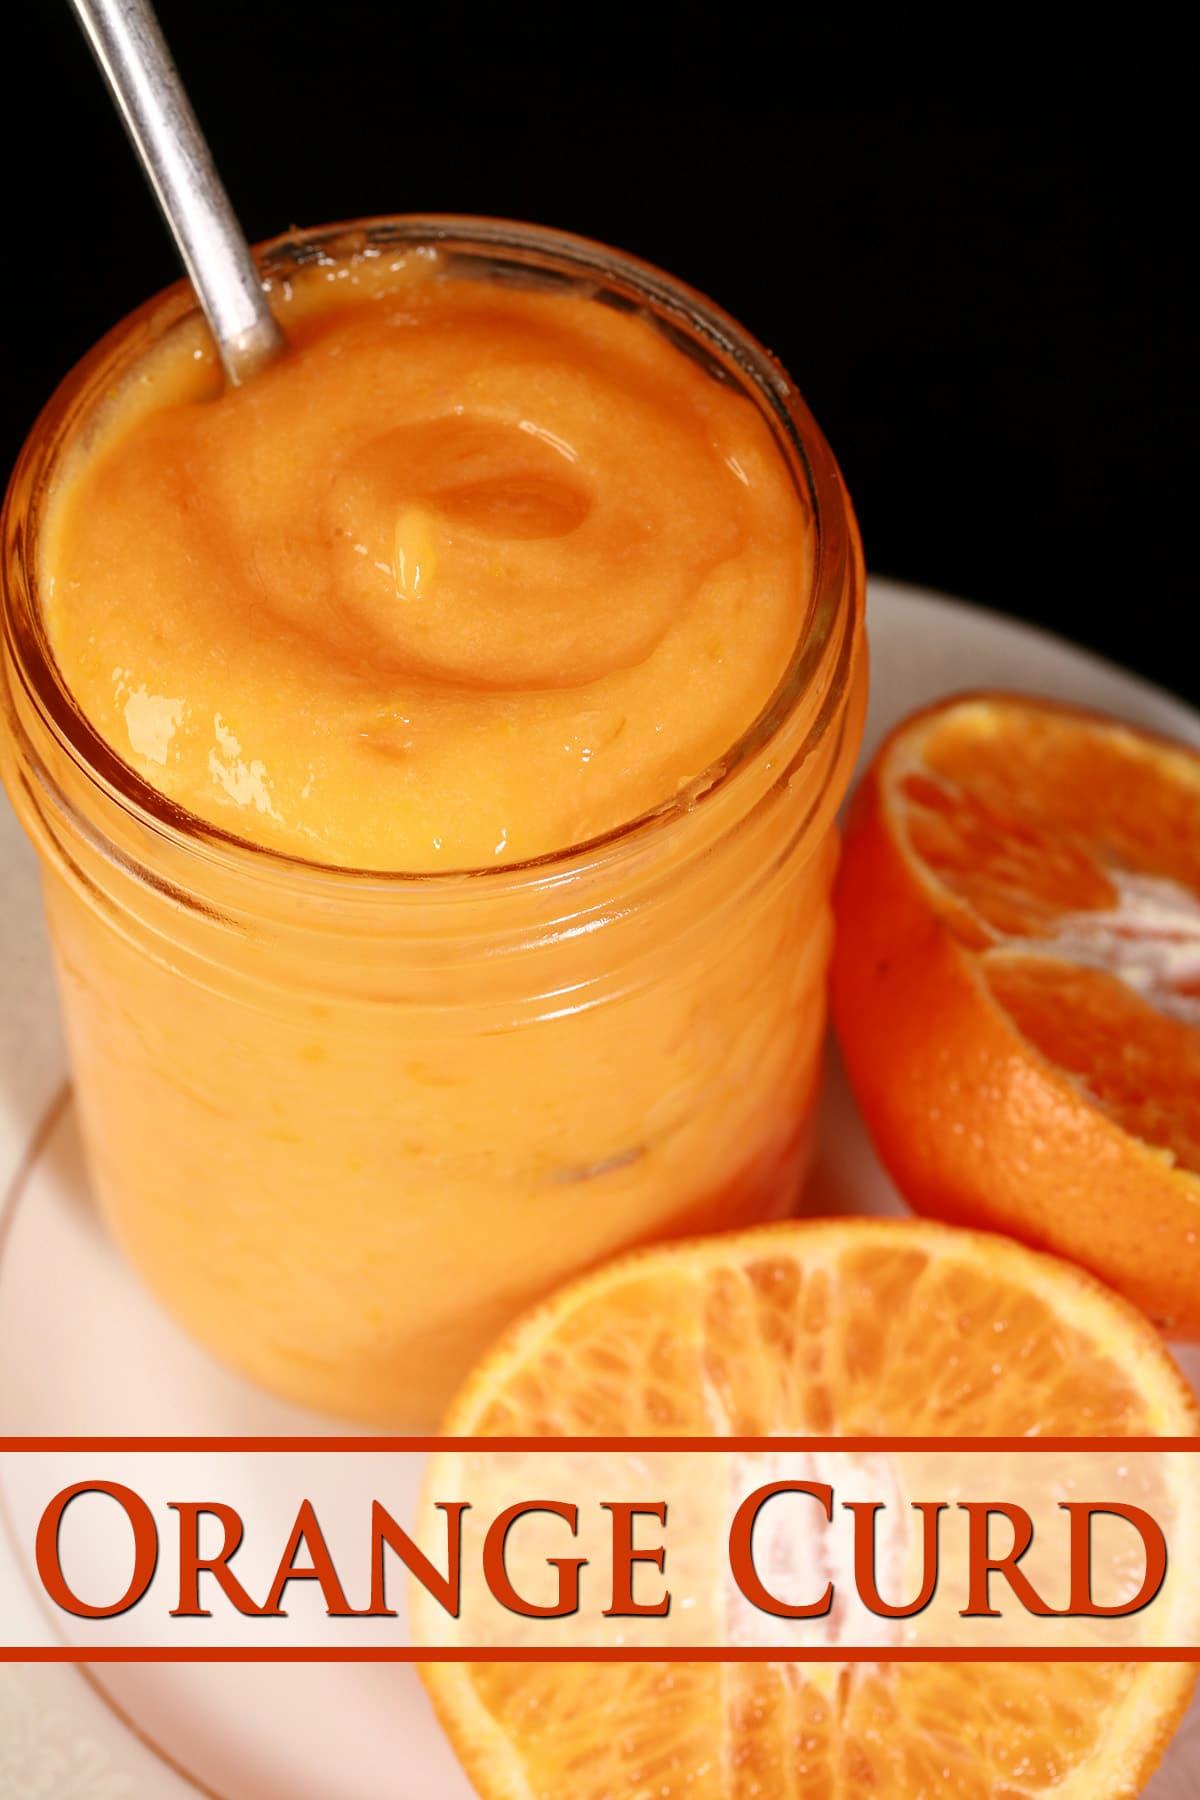 A jar of orange curd on a plate, along with a sliced orange.